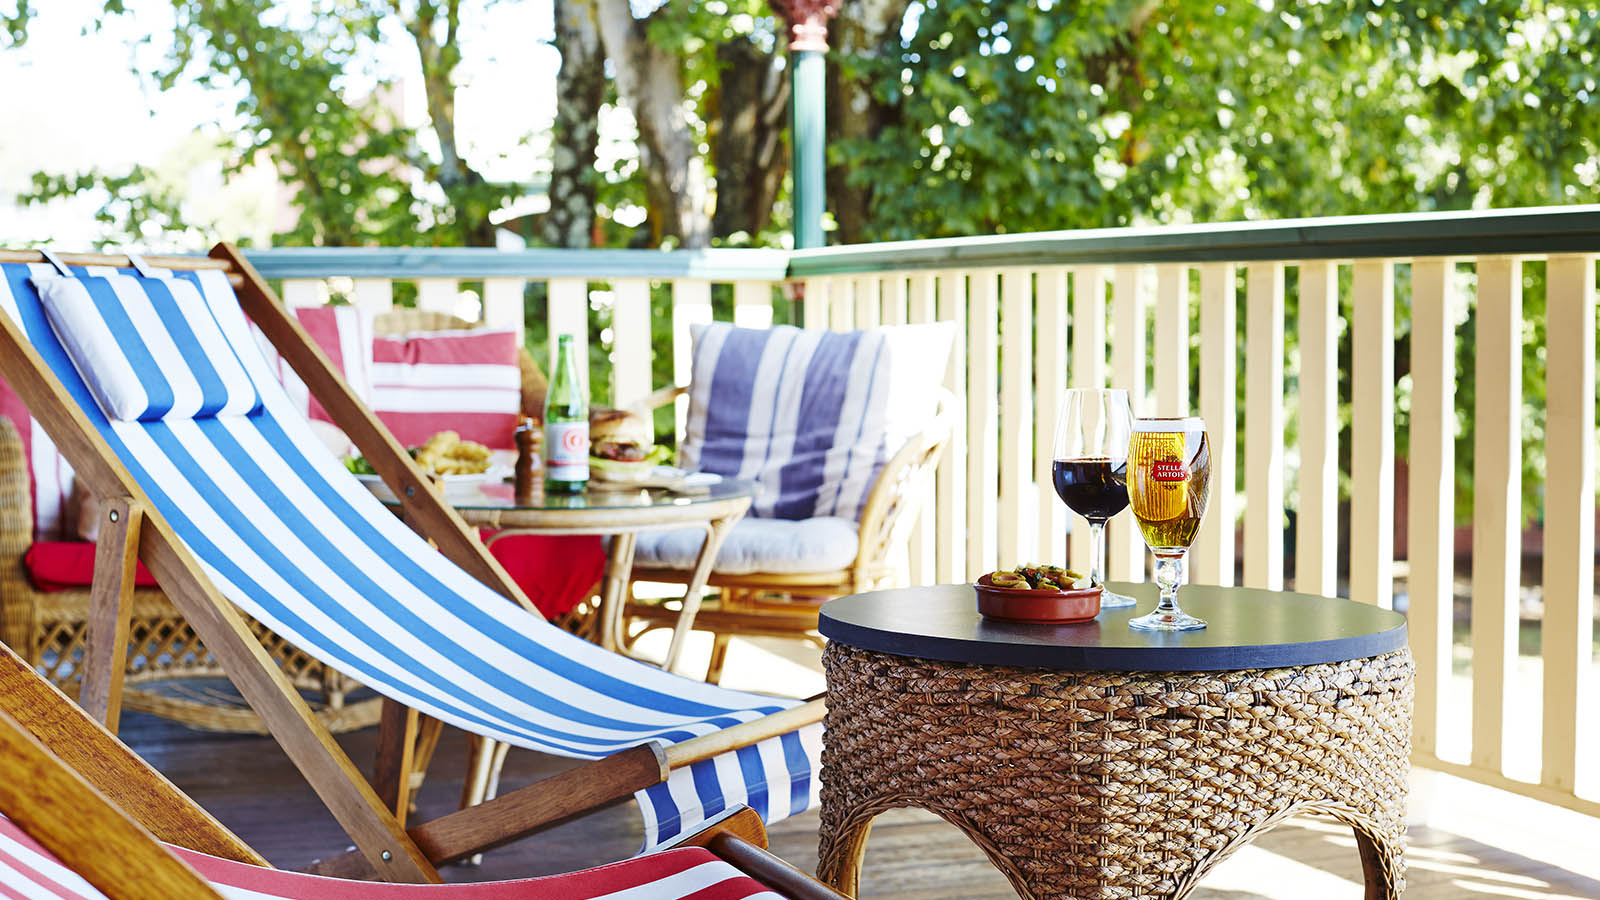 Daylesford Hotel, Daylesford and the Macedon Ranges, Victoria, Australia